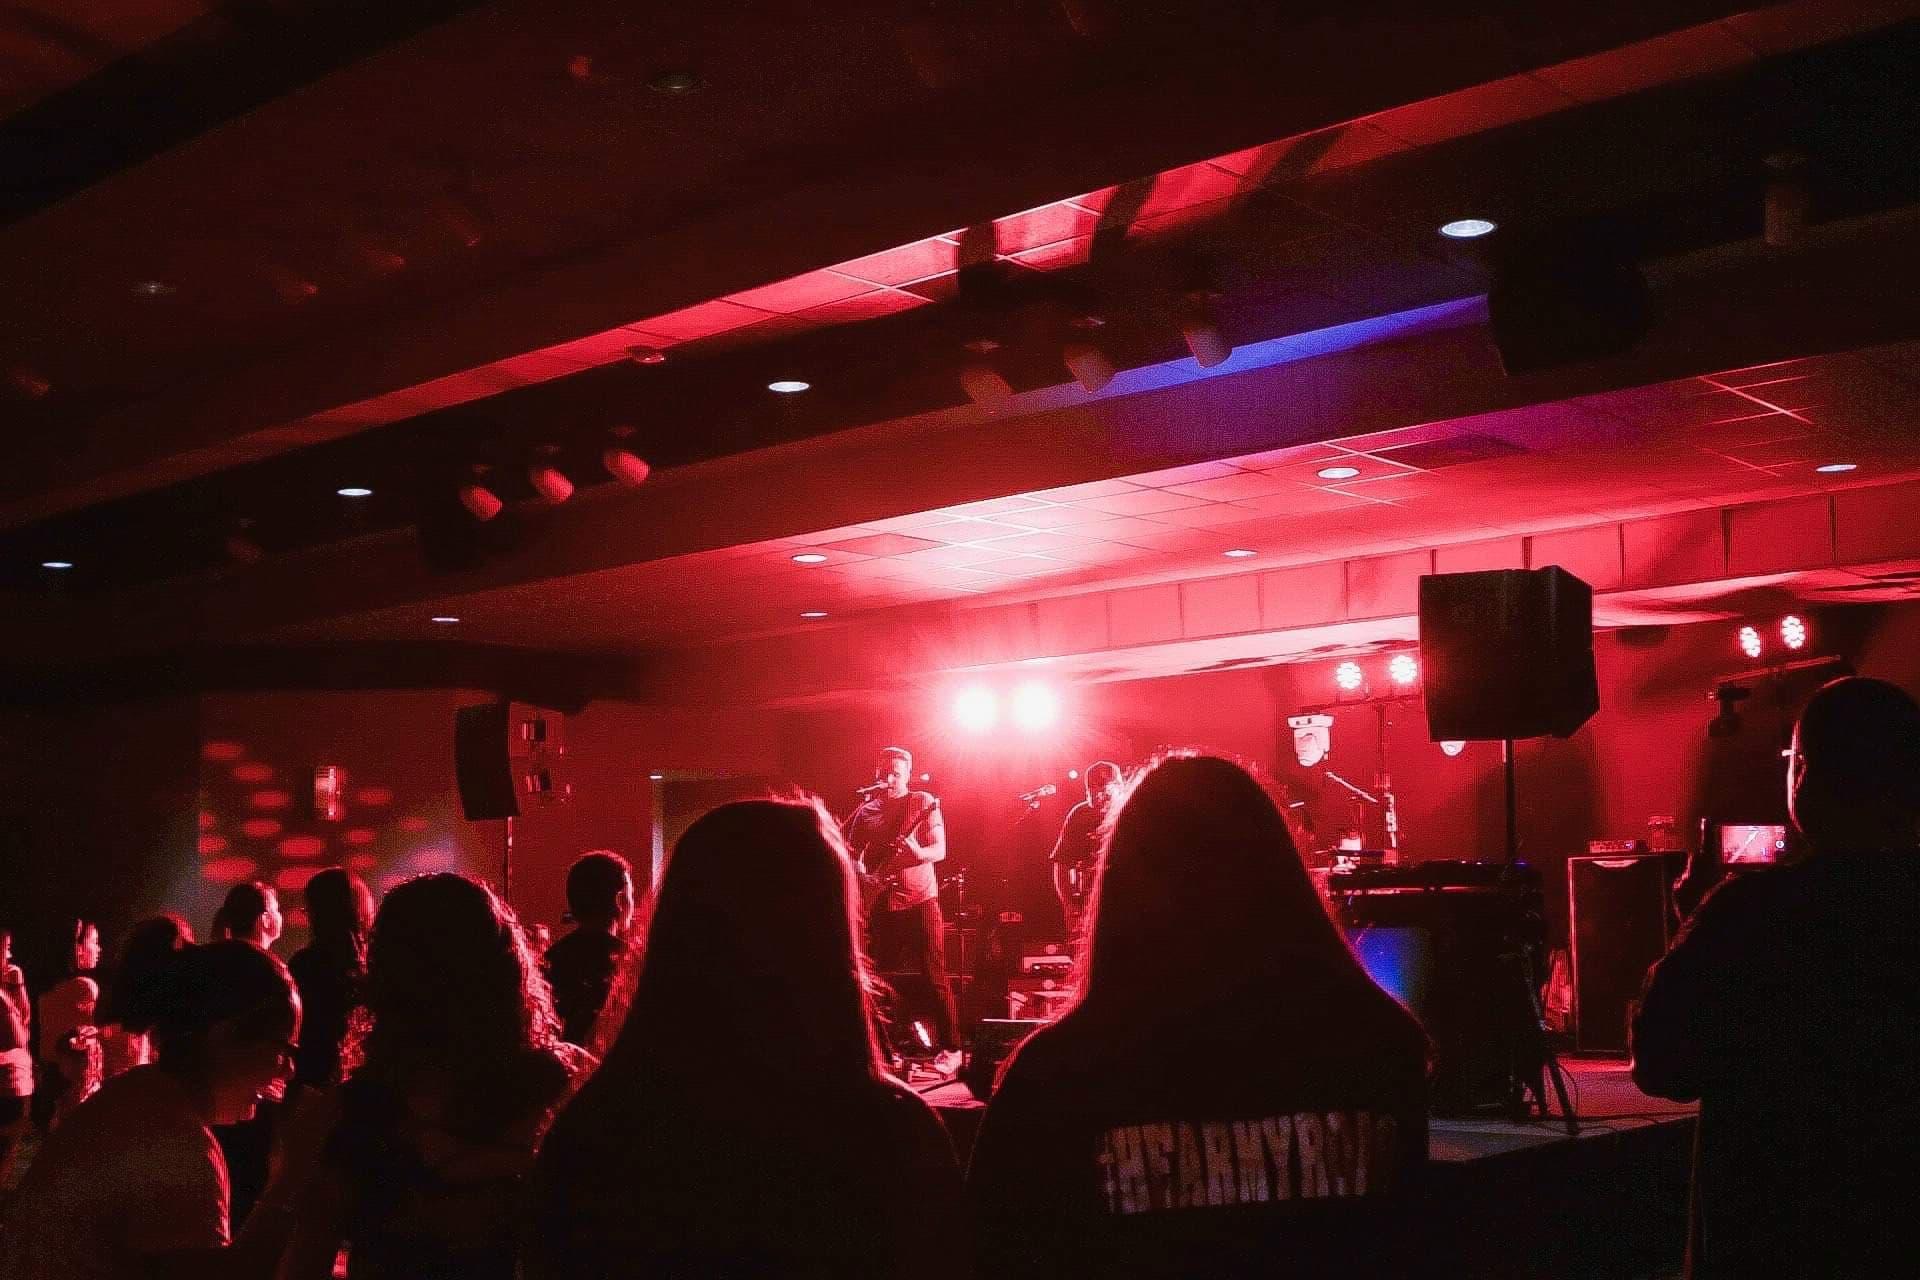 Concert_Red.jpg